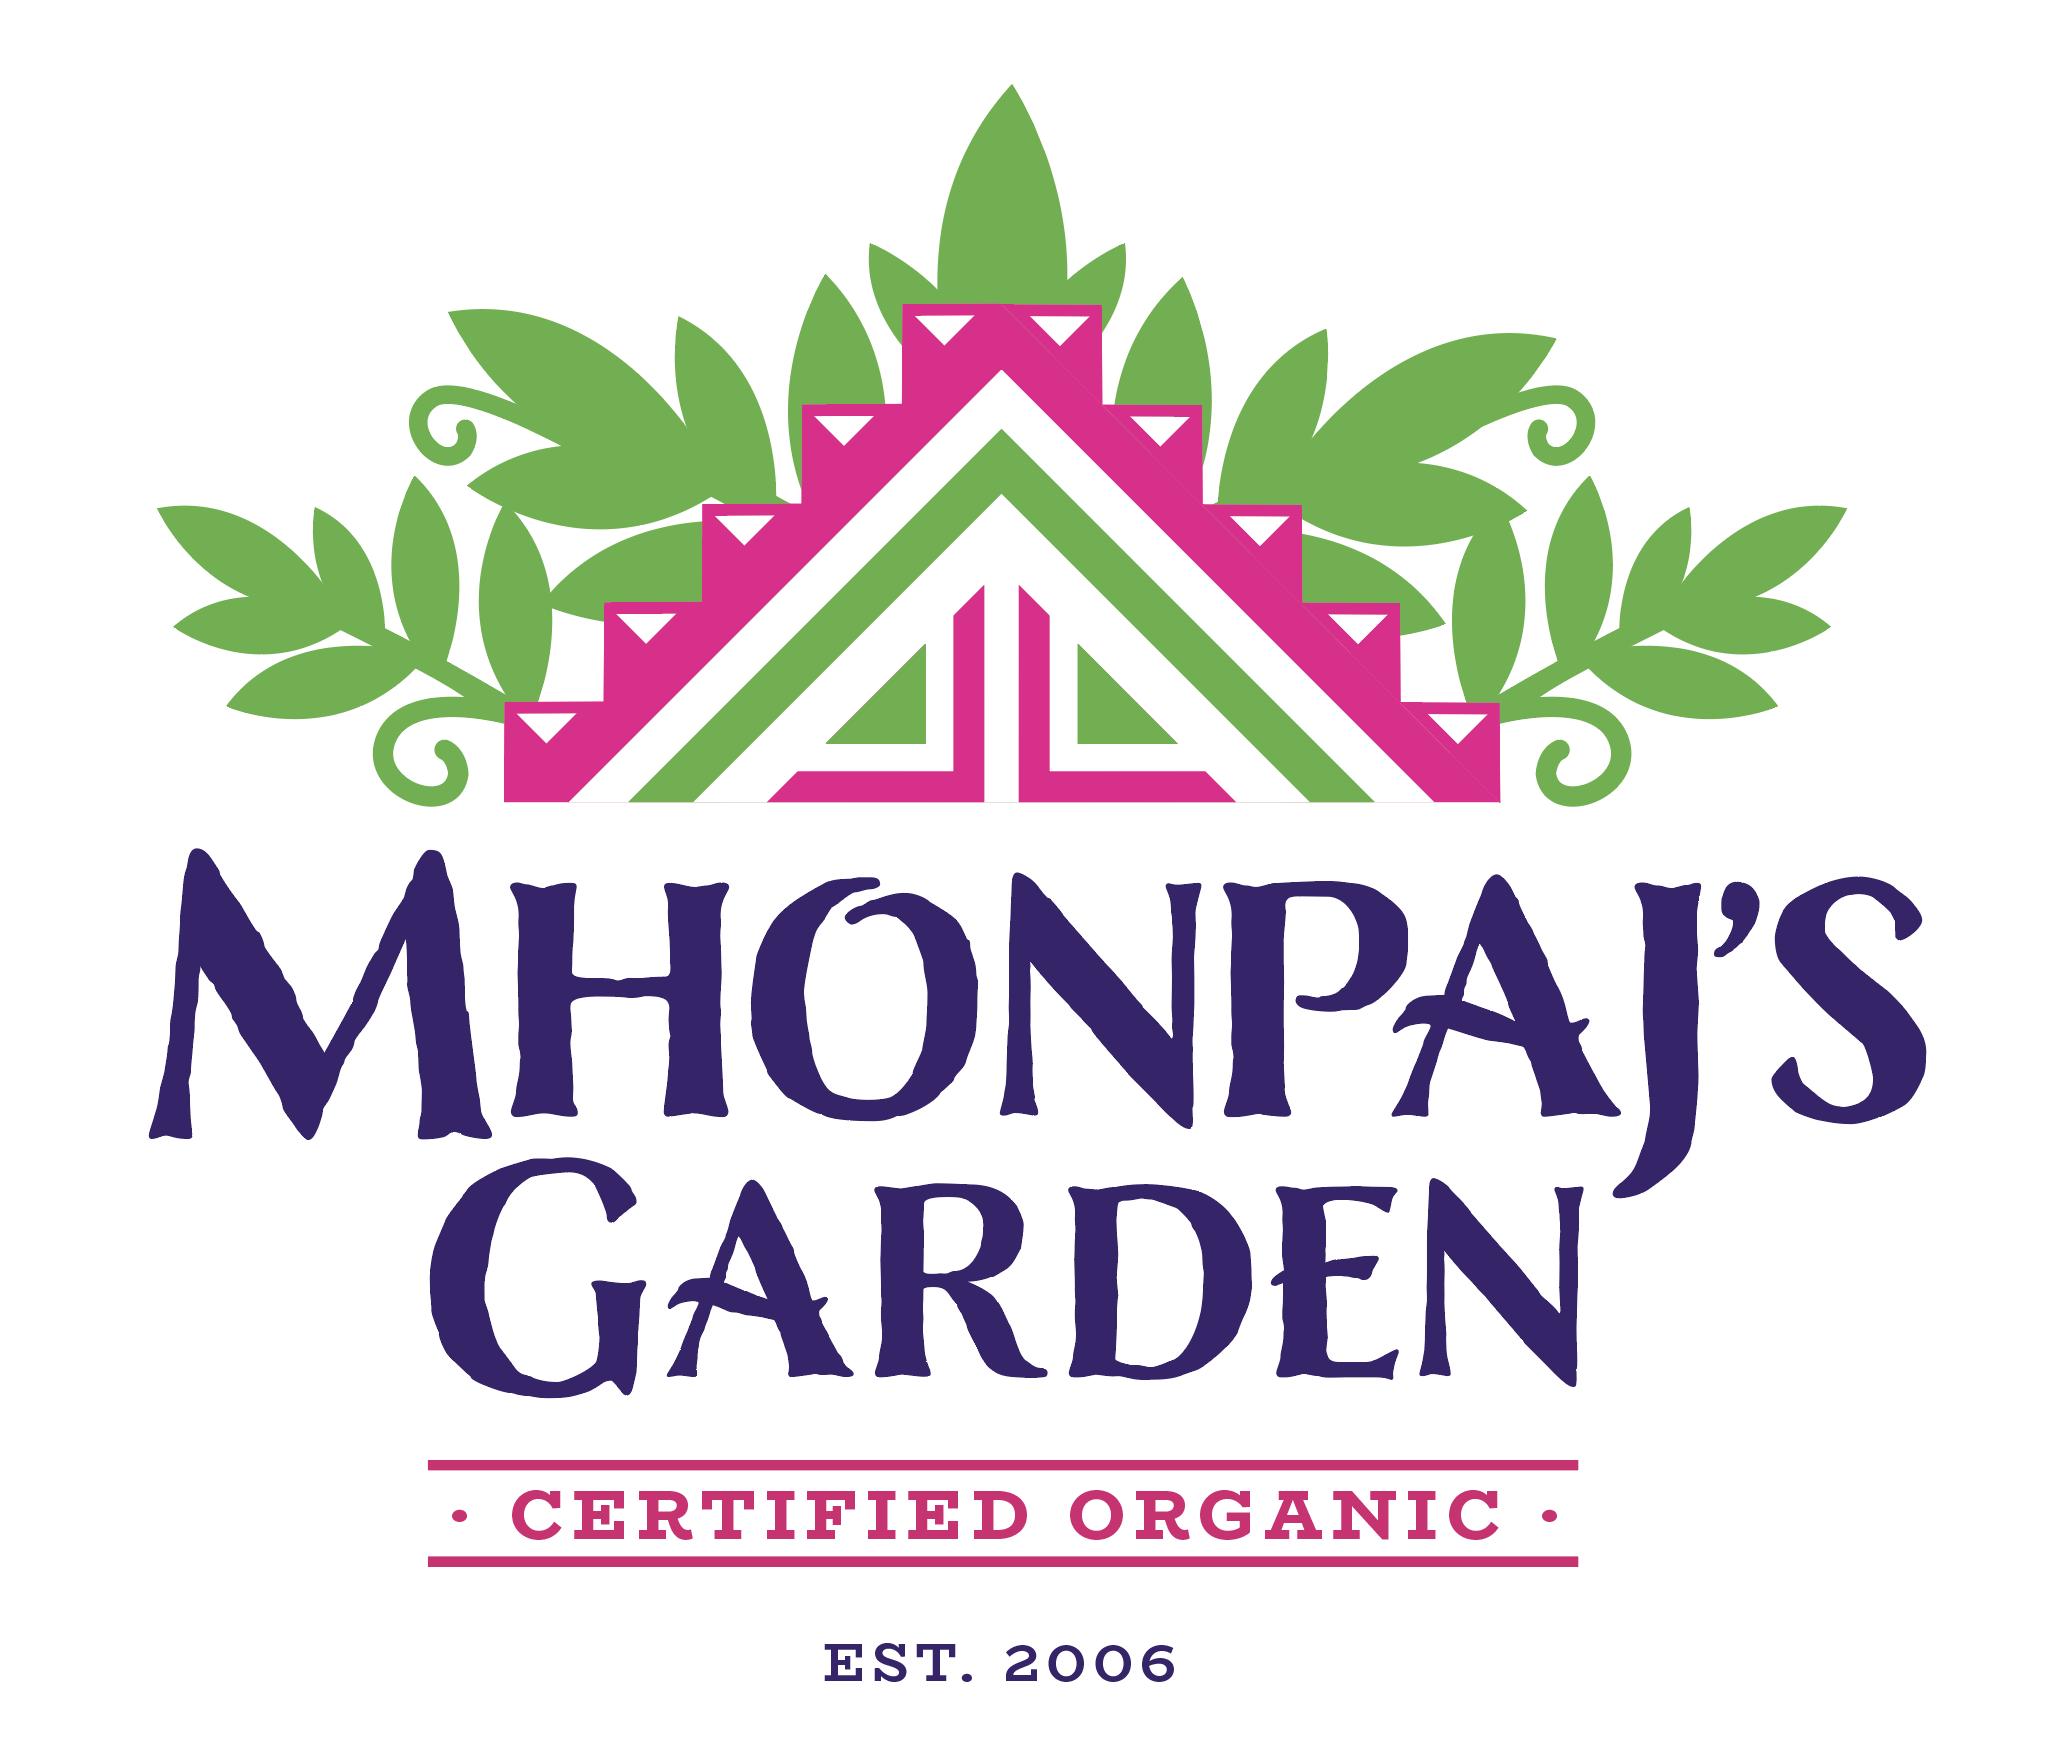 Mhonpaj's Garden